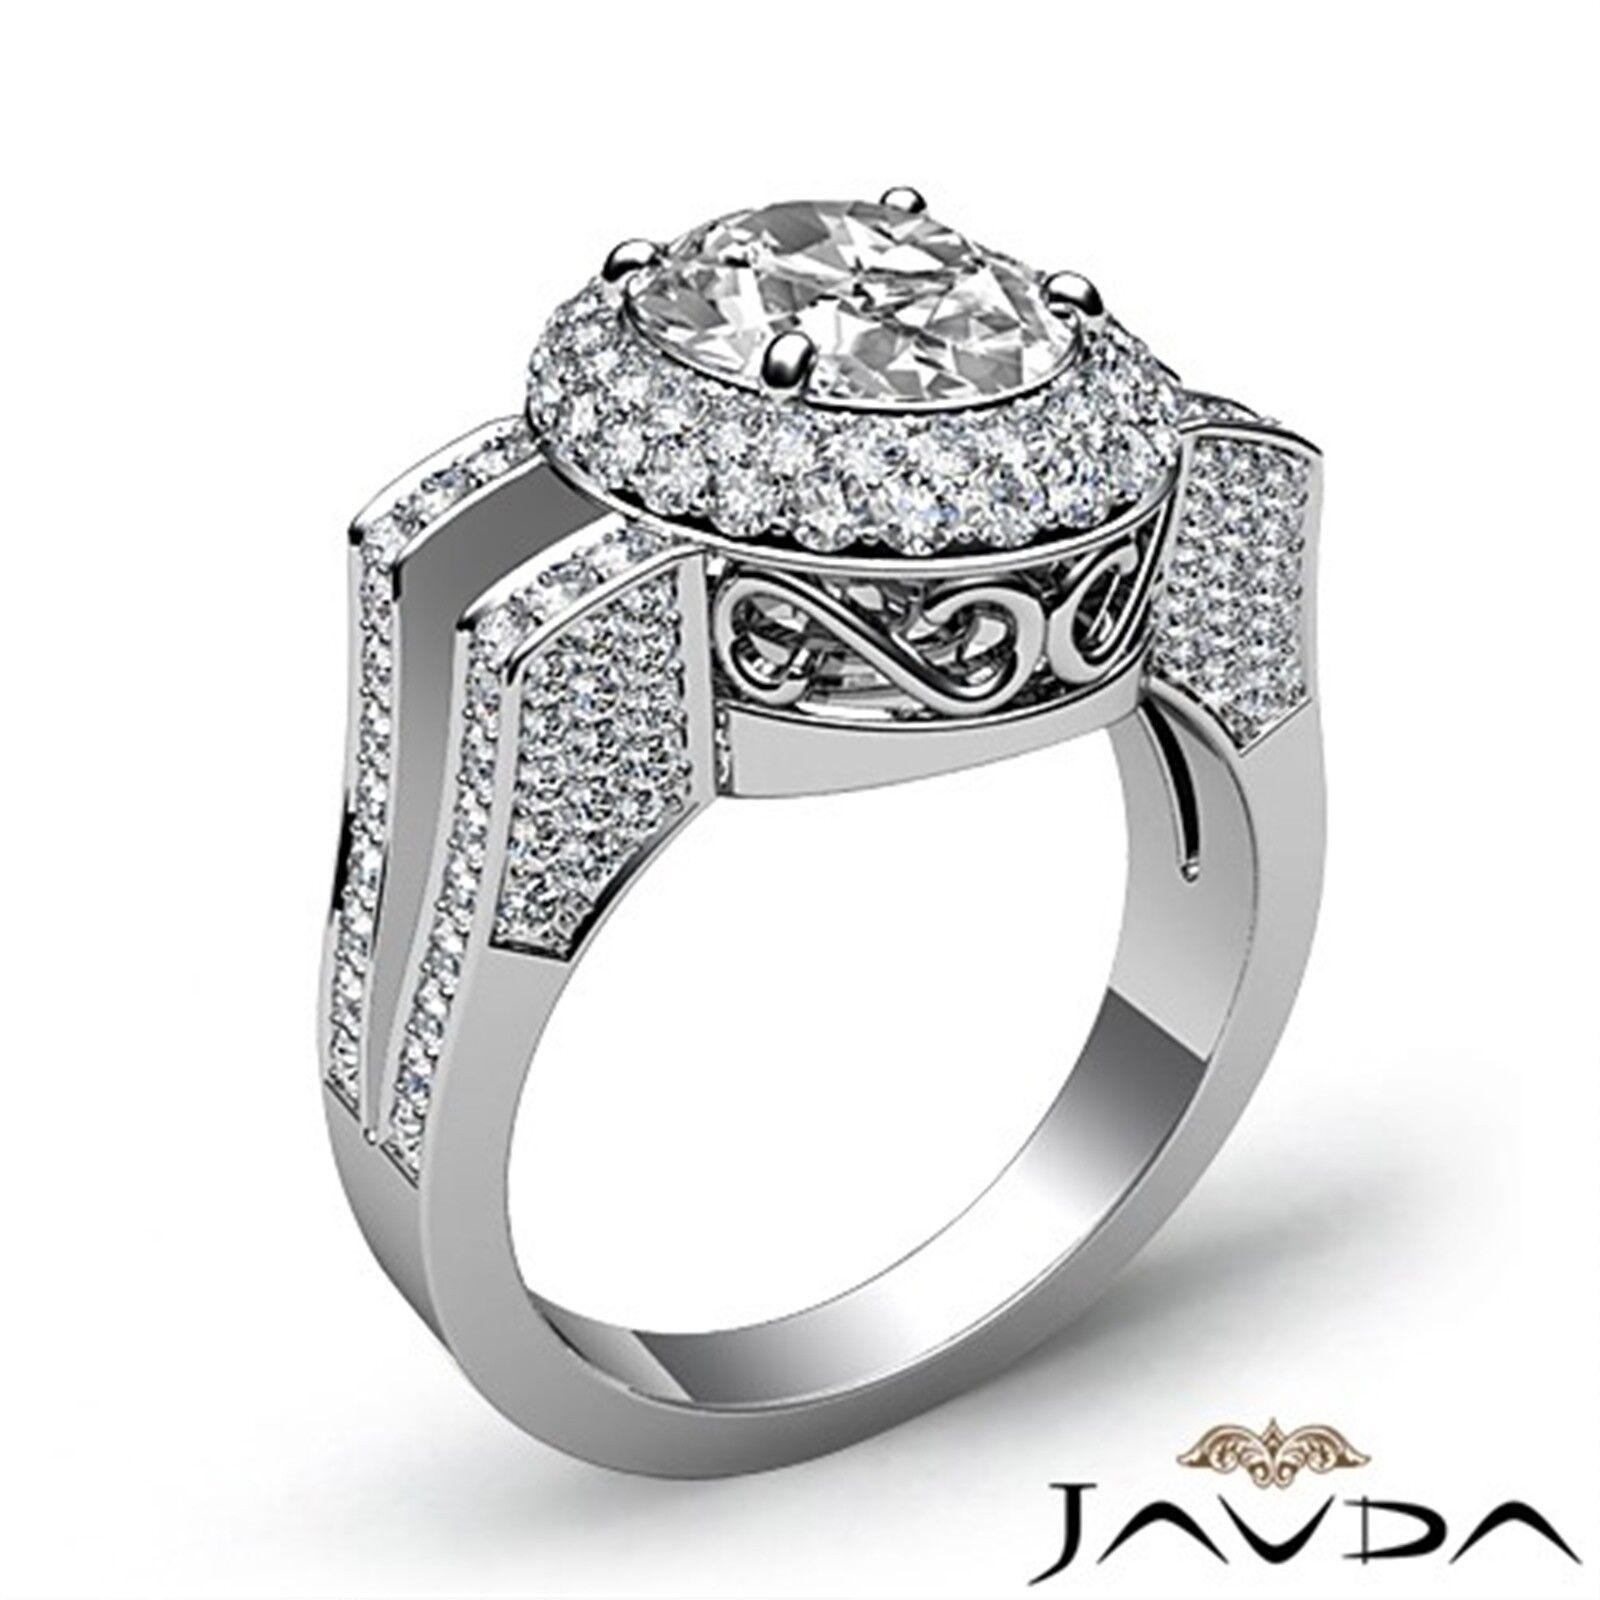 1.9ctw Gala Halo Split Shank Oval Diamond Engagement Ring GIA E-VS2 White Gold 1